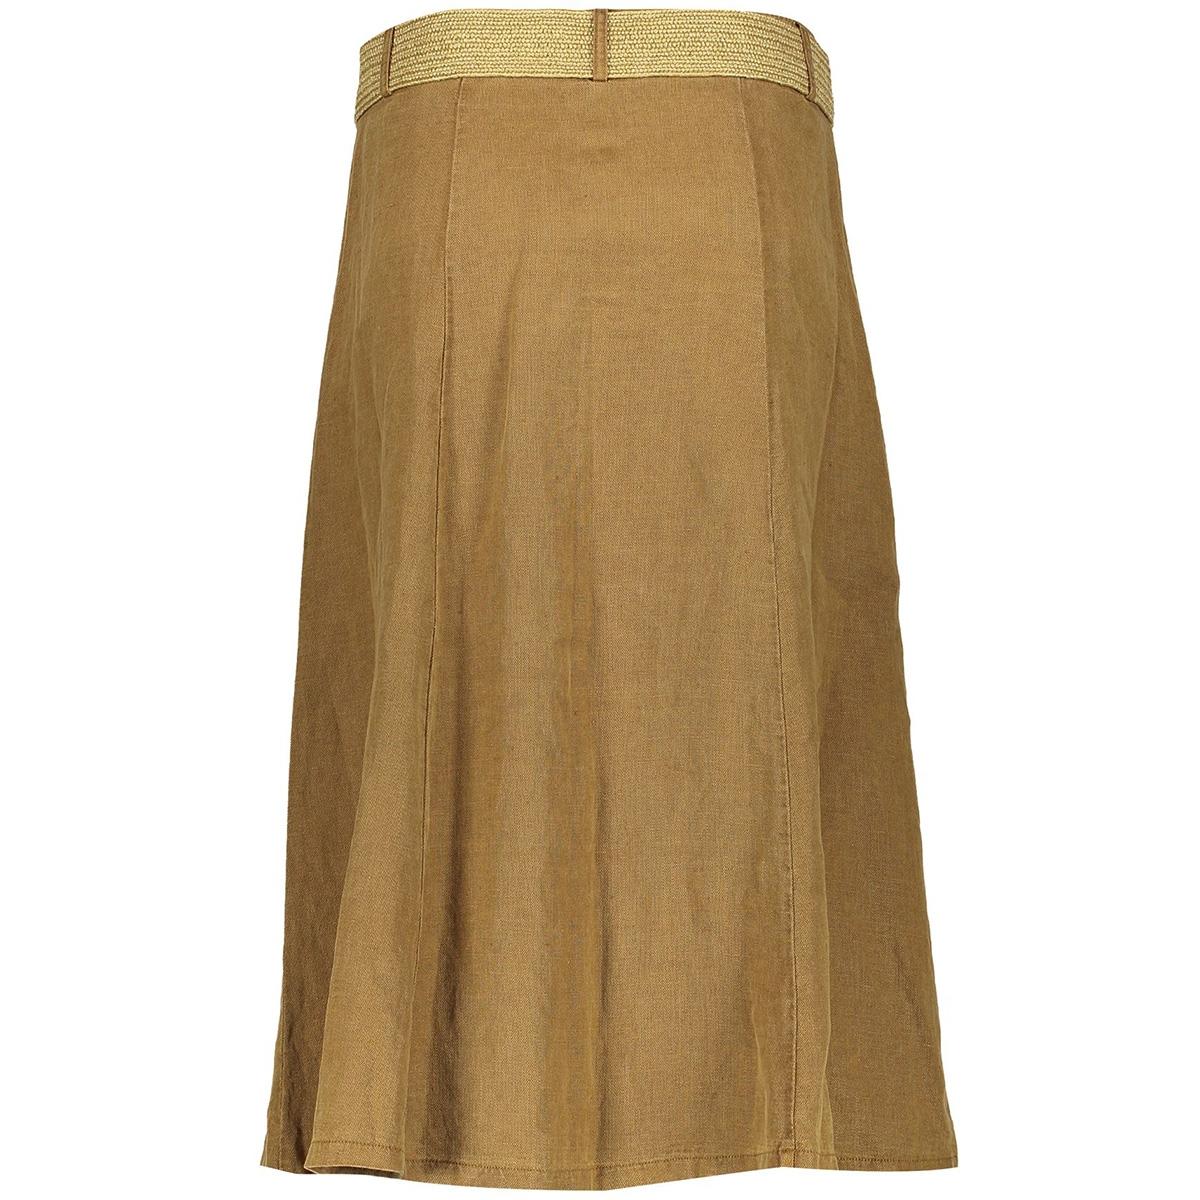 skirt with belt 06300 10 geisha rok tabacco